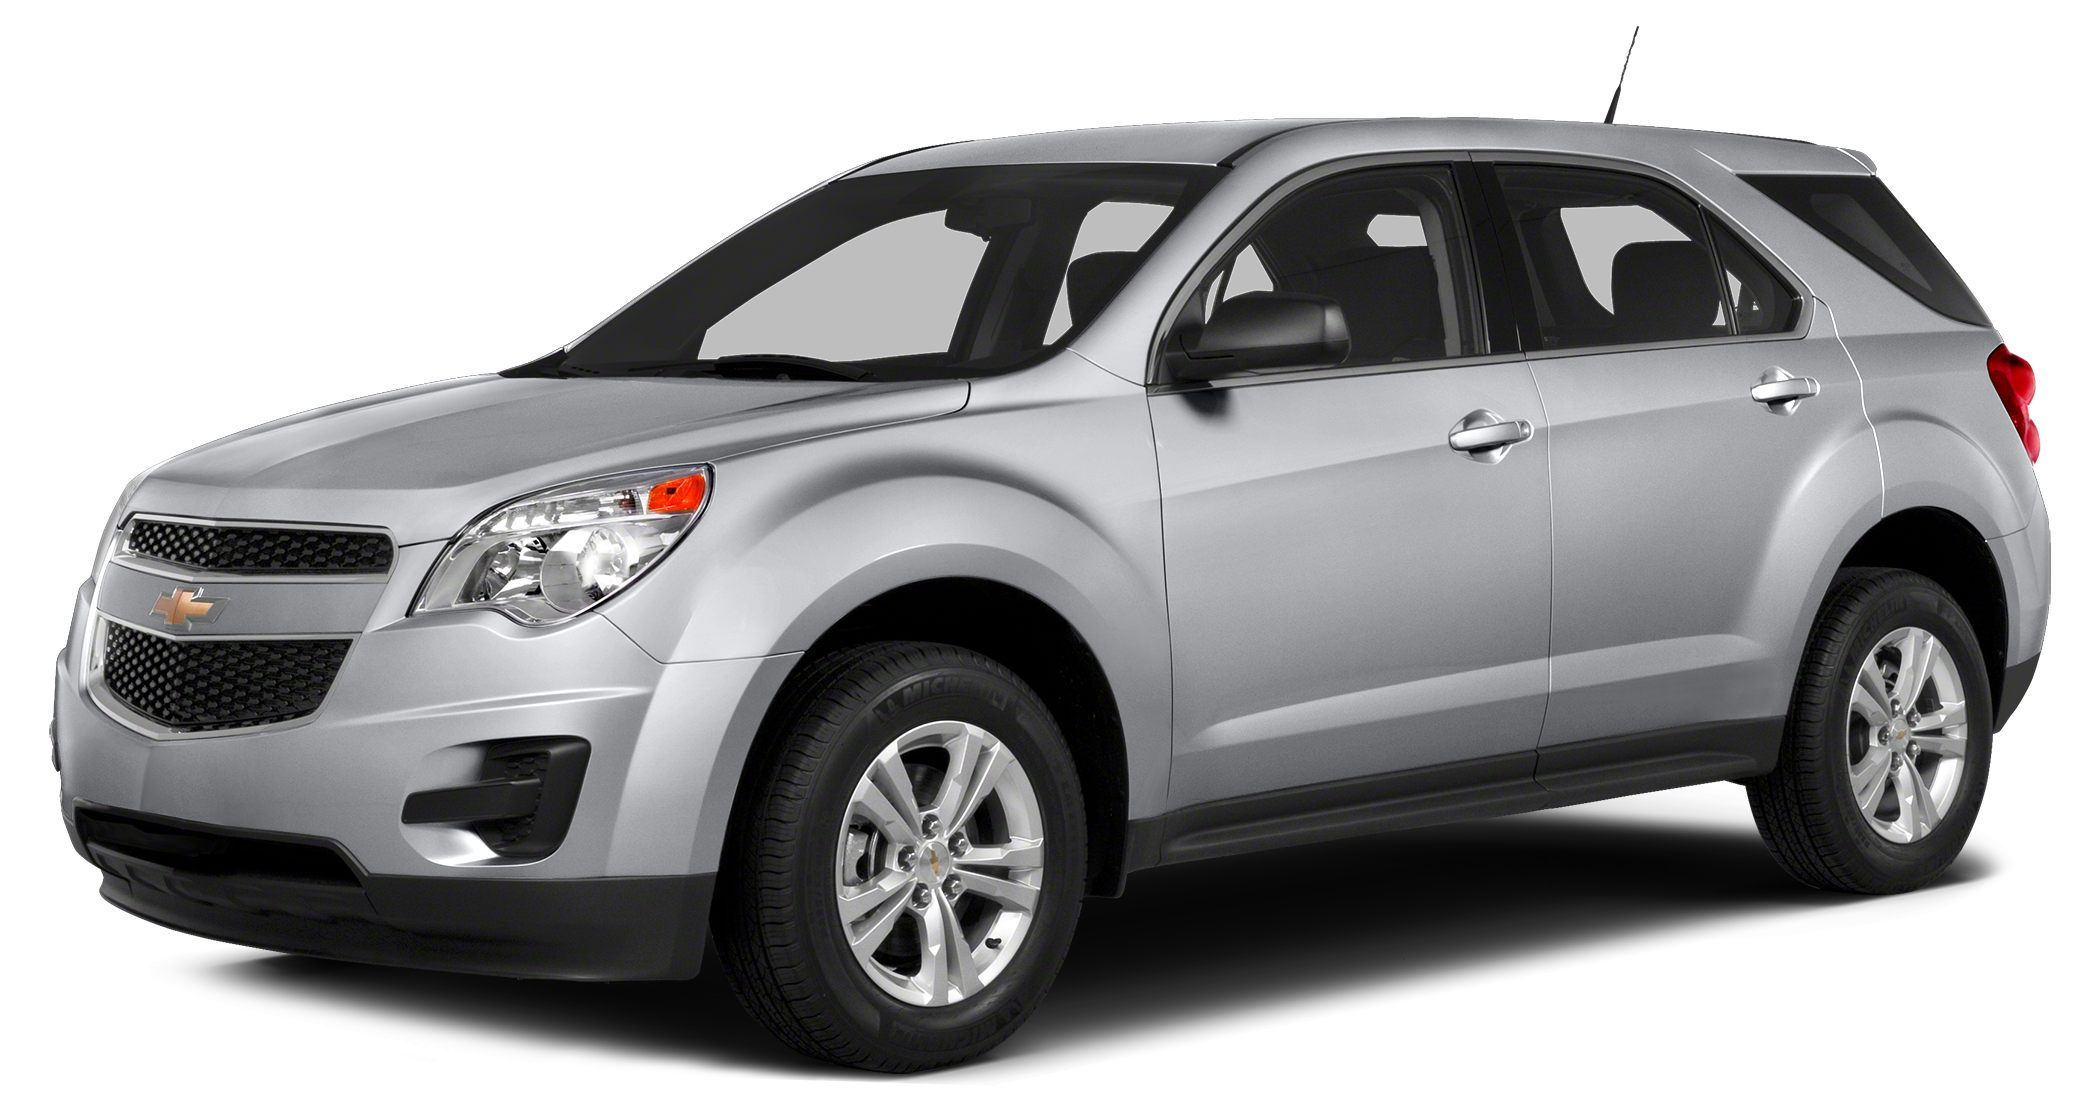 2013 Chevrolet Equinox LS 1 OWNER  CLEAN CARFAX REPORT  Runs mint Less tha